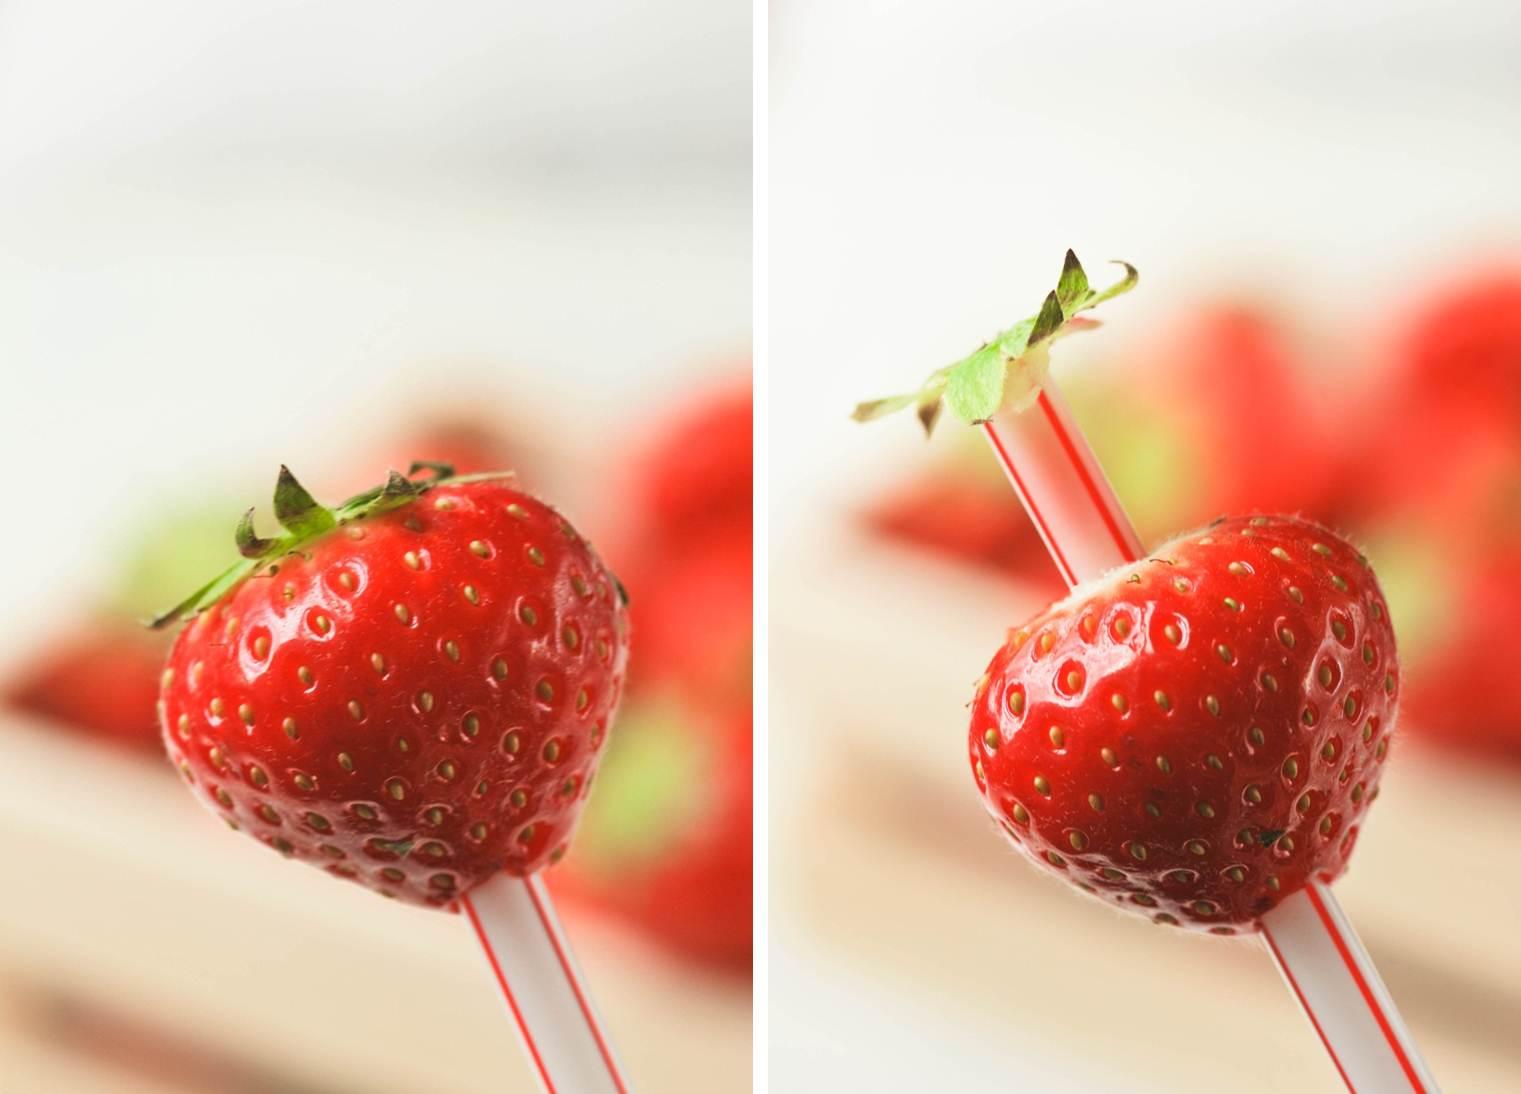 Limpiar fresas